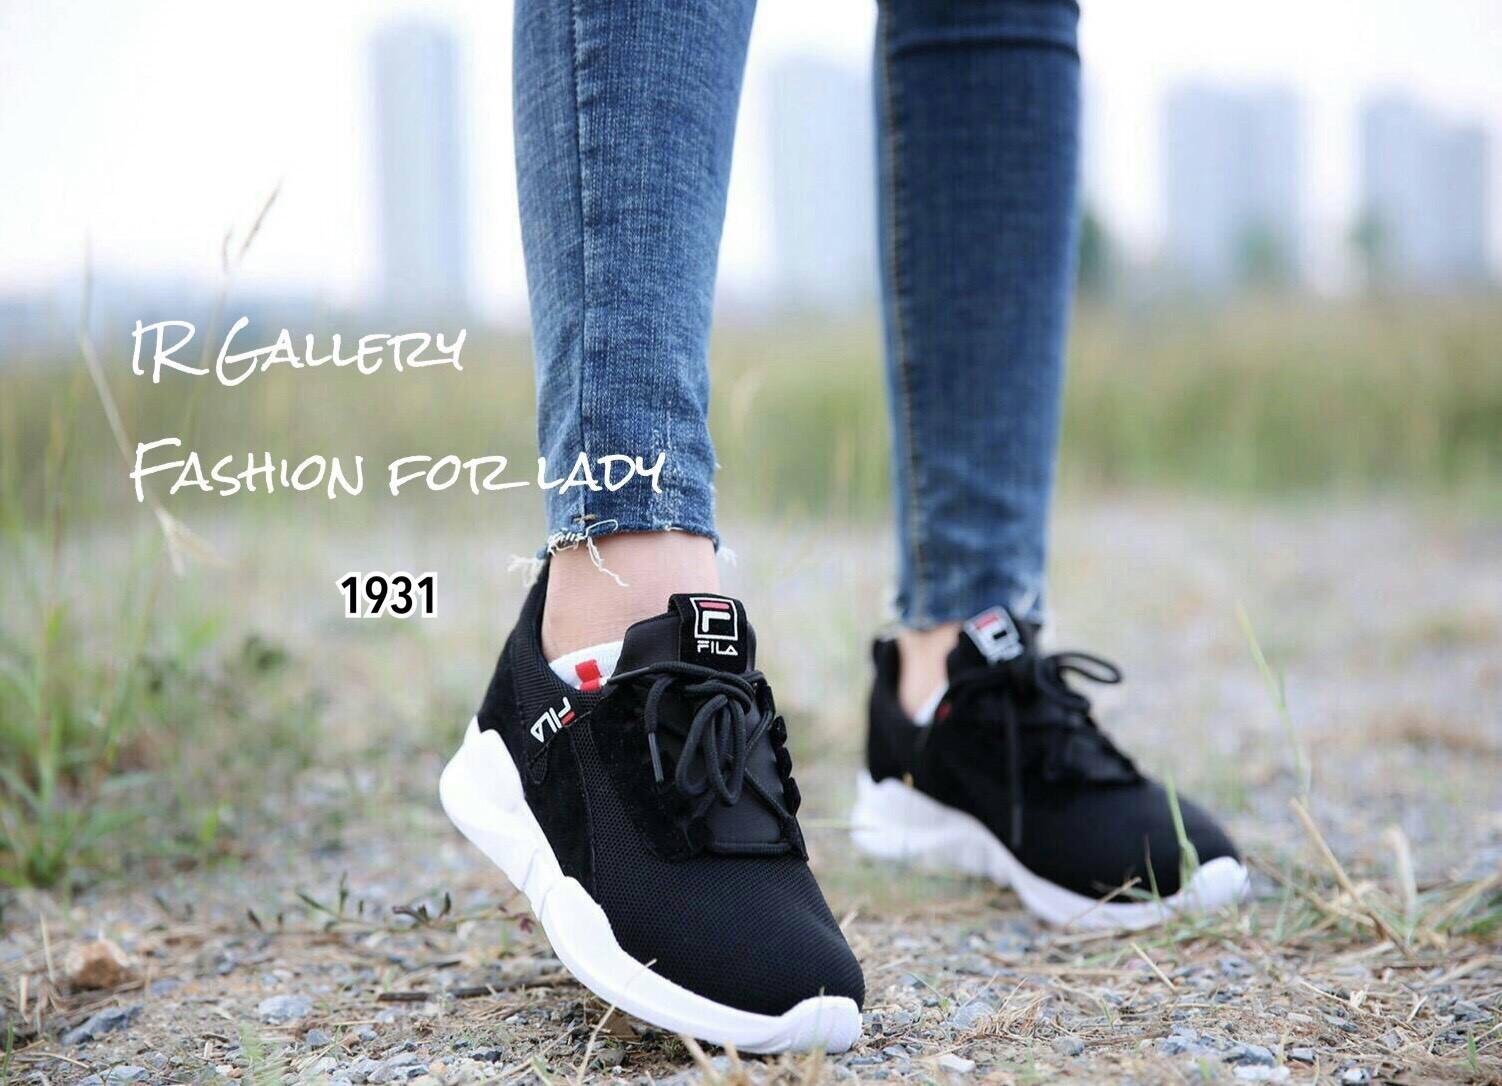 2018 sneakers exklusiva skor bästa försäljning รองเท้าผ้าใบ Style FILA (สีดำ) | PChome Thai